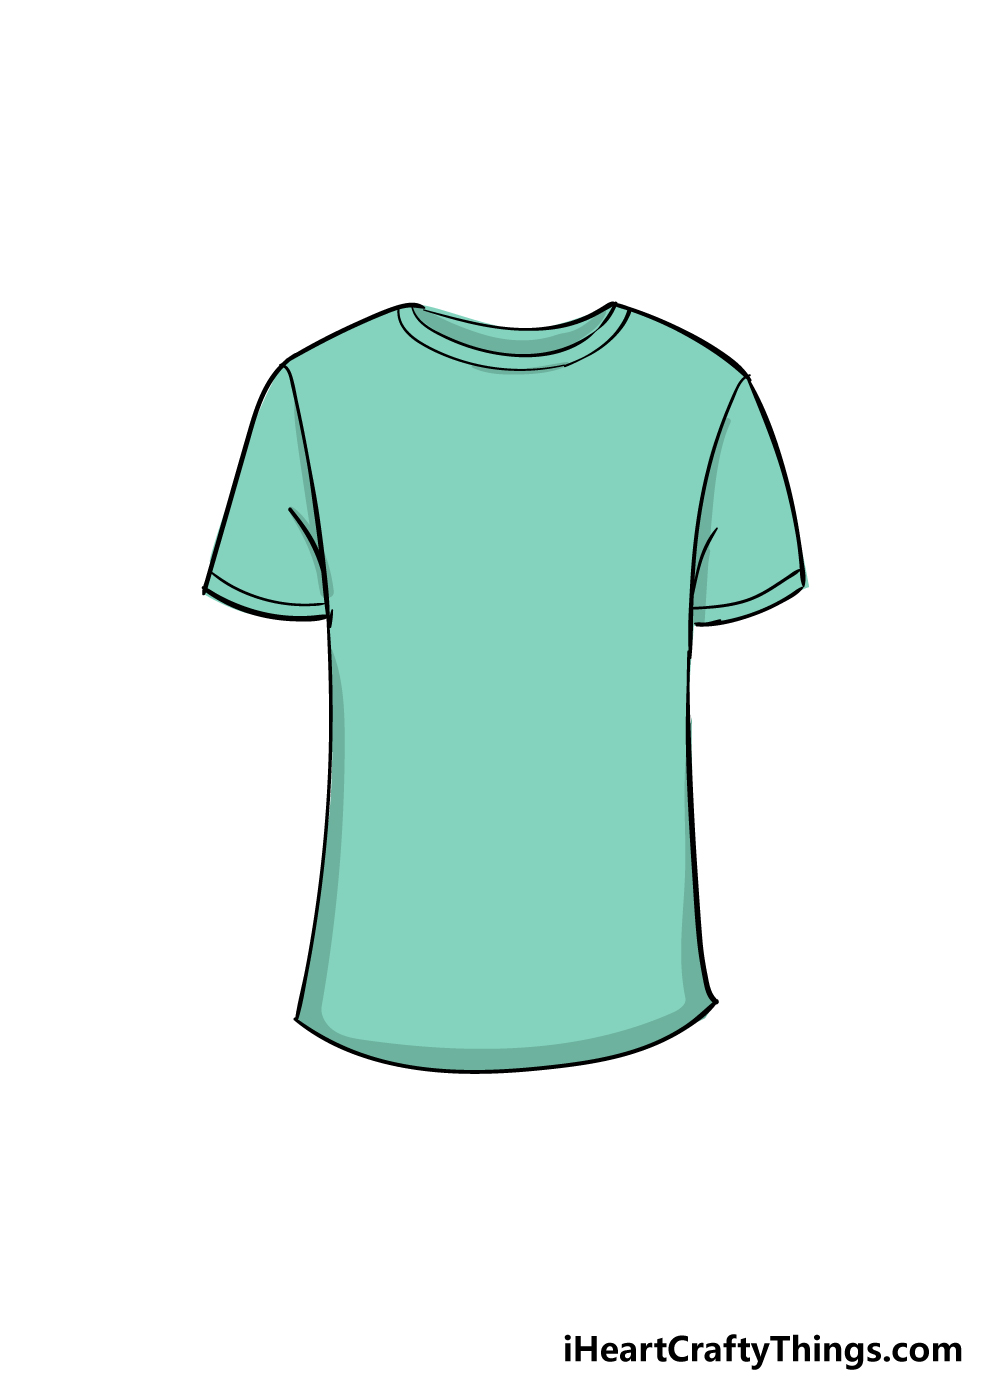 shirt drawing step 6